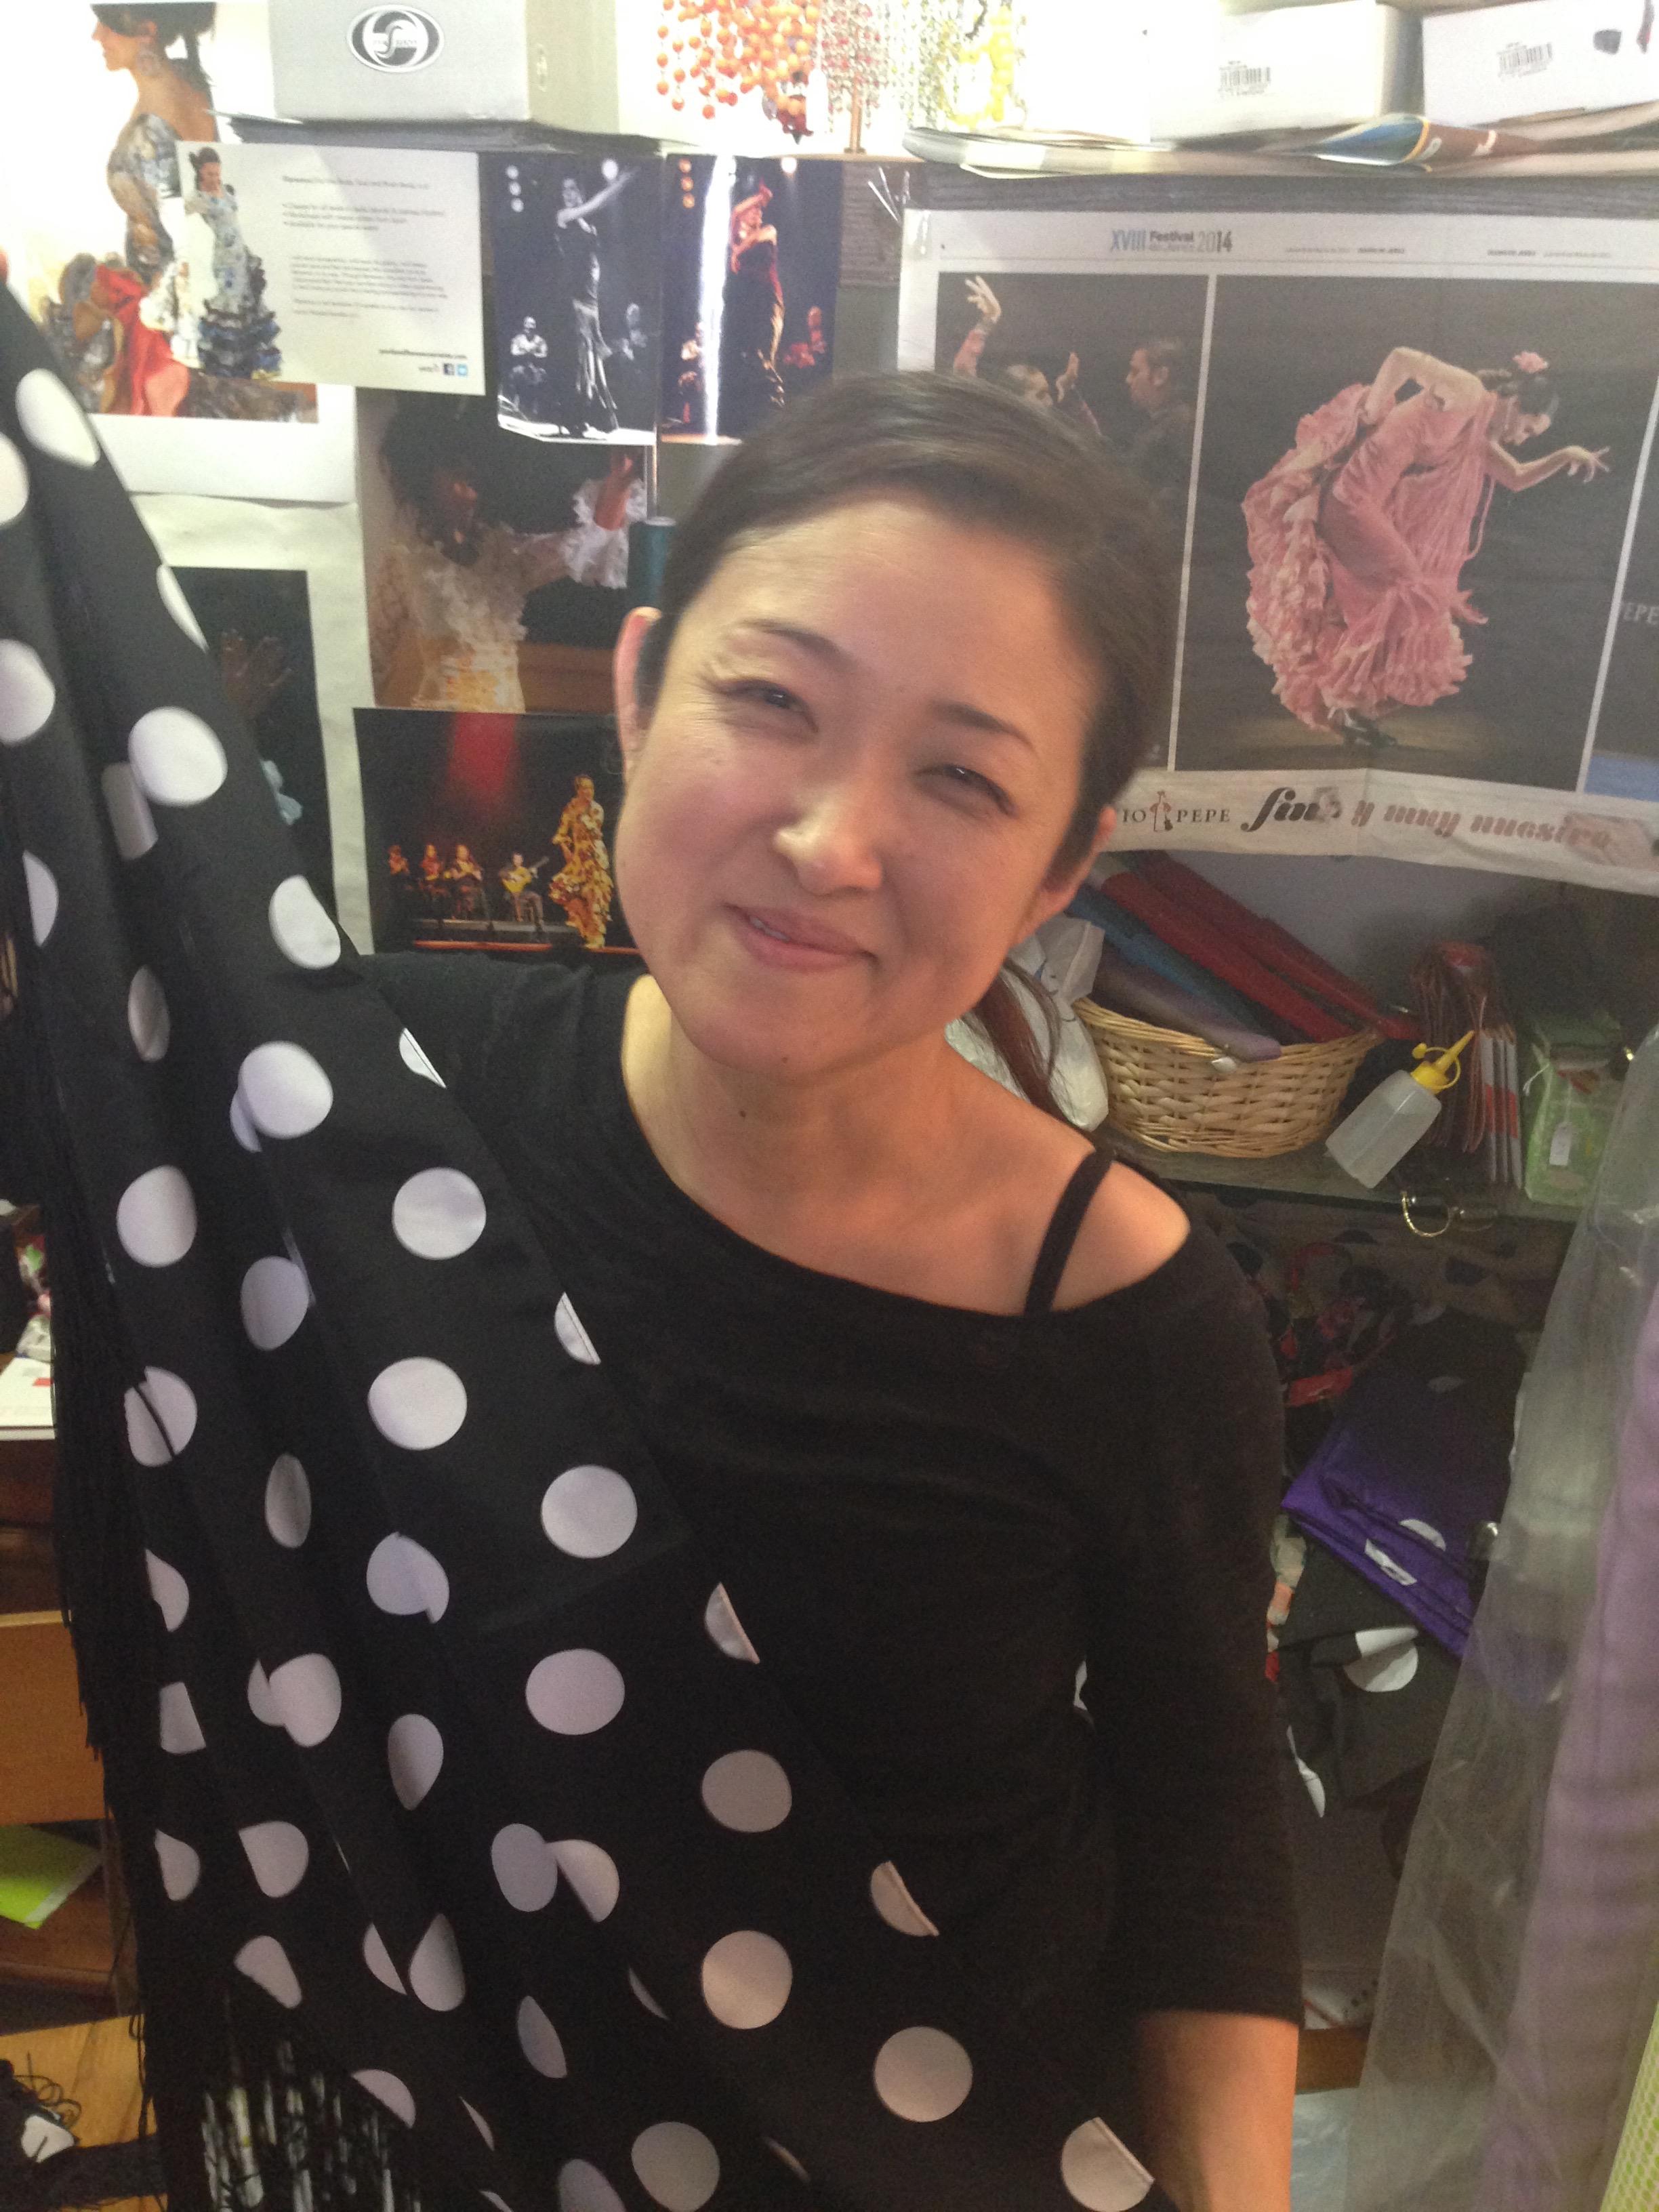 kikuyo with skirt.jpg